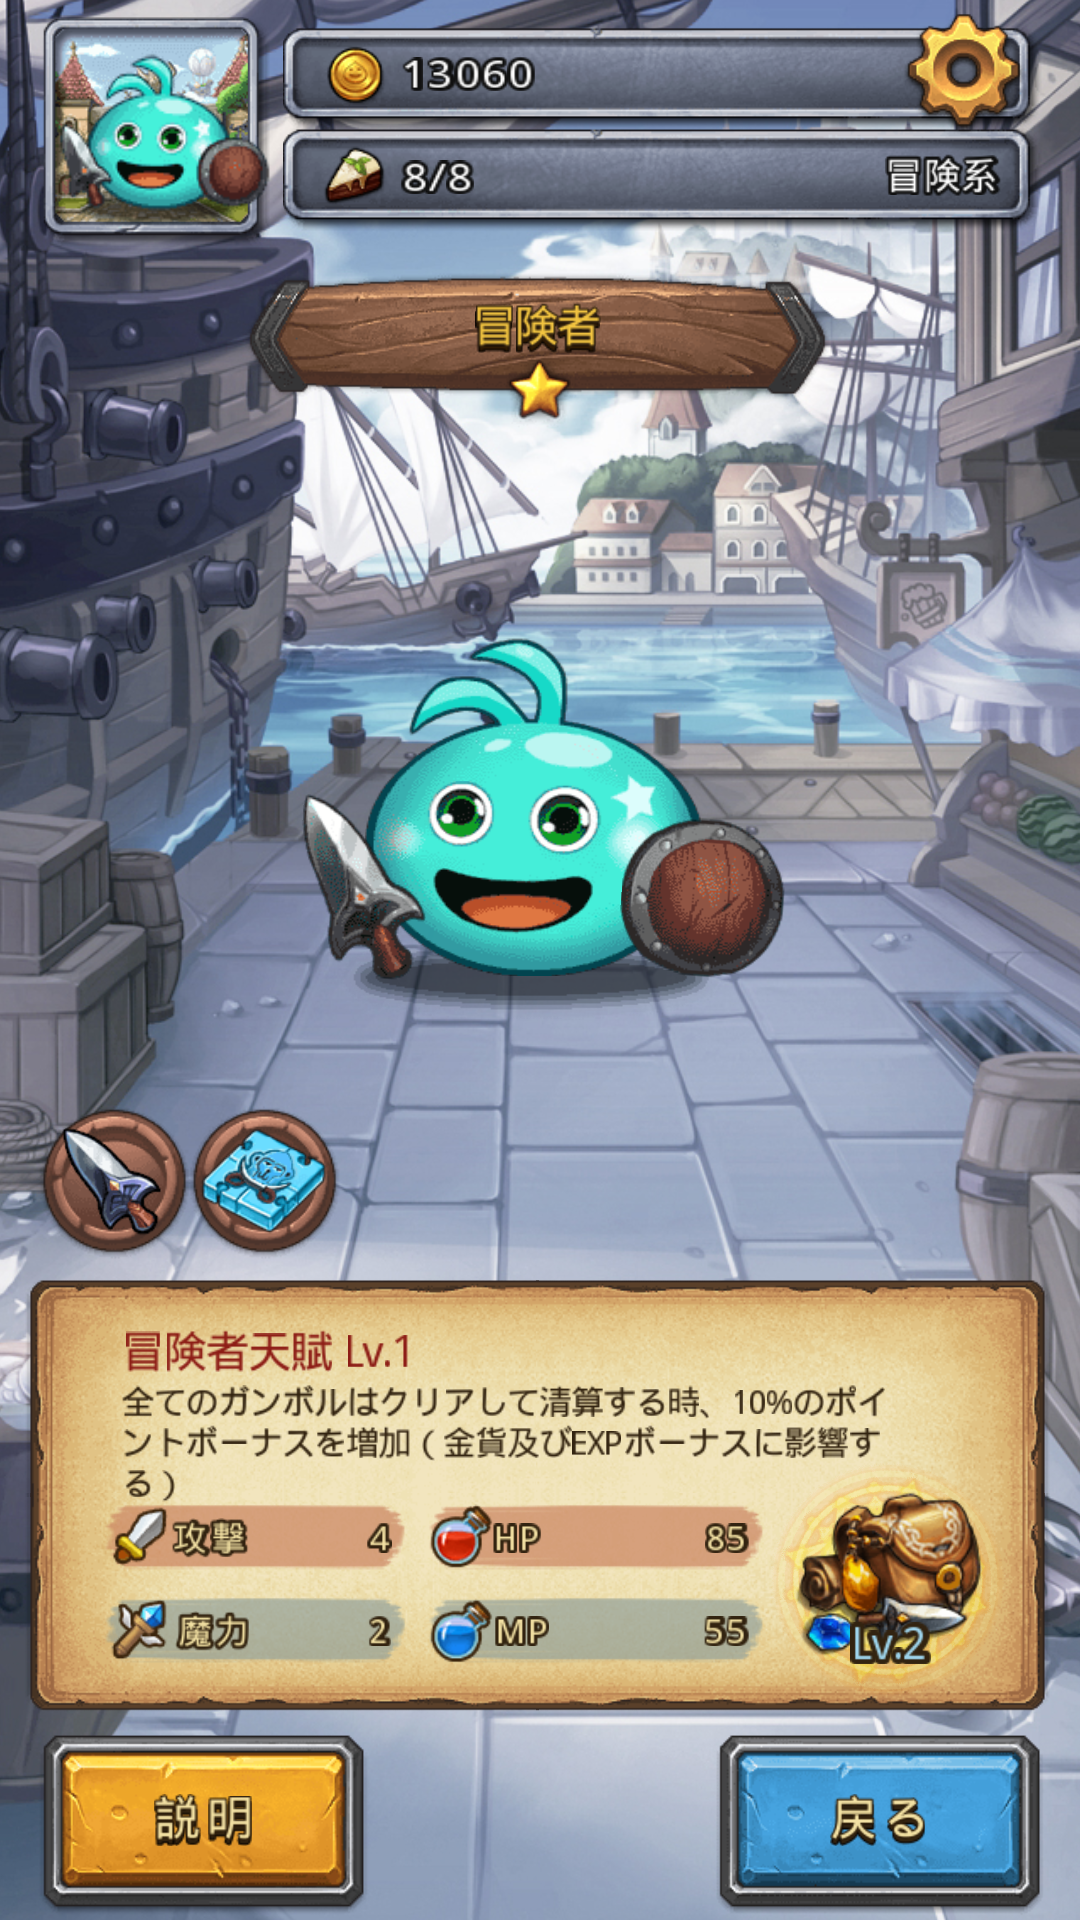 androidアプリ ダンジョンズ&ガンボル(Gumballs & Dungeons)攻略スクリーンショット7